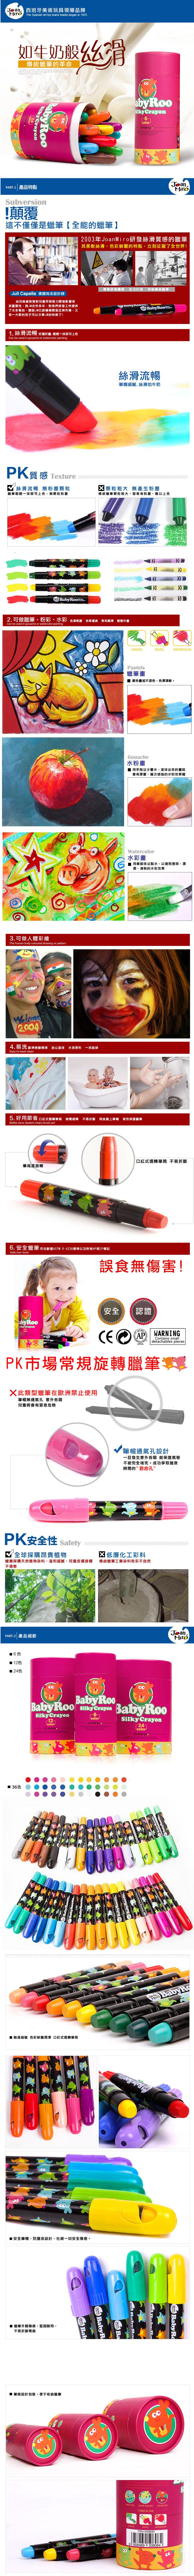 36色蠟筆